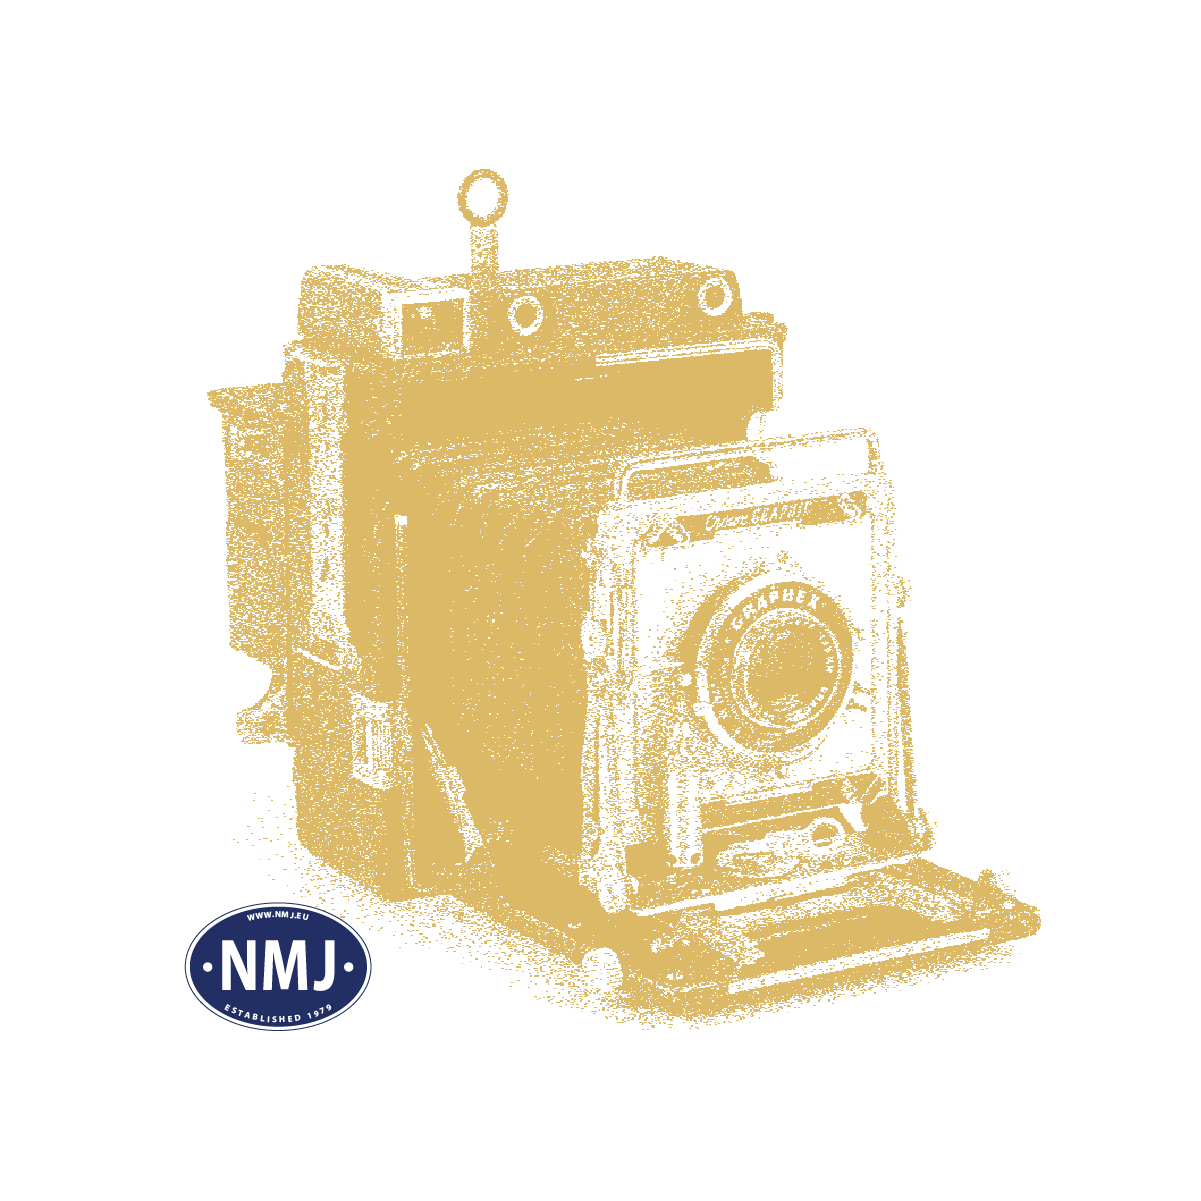 NMJT80.203 - NMJ Topline NSB EL17.2231, DC